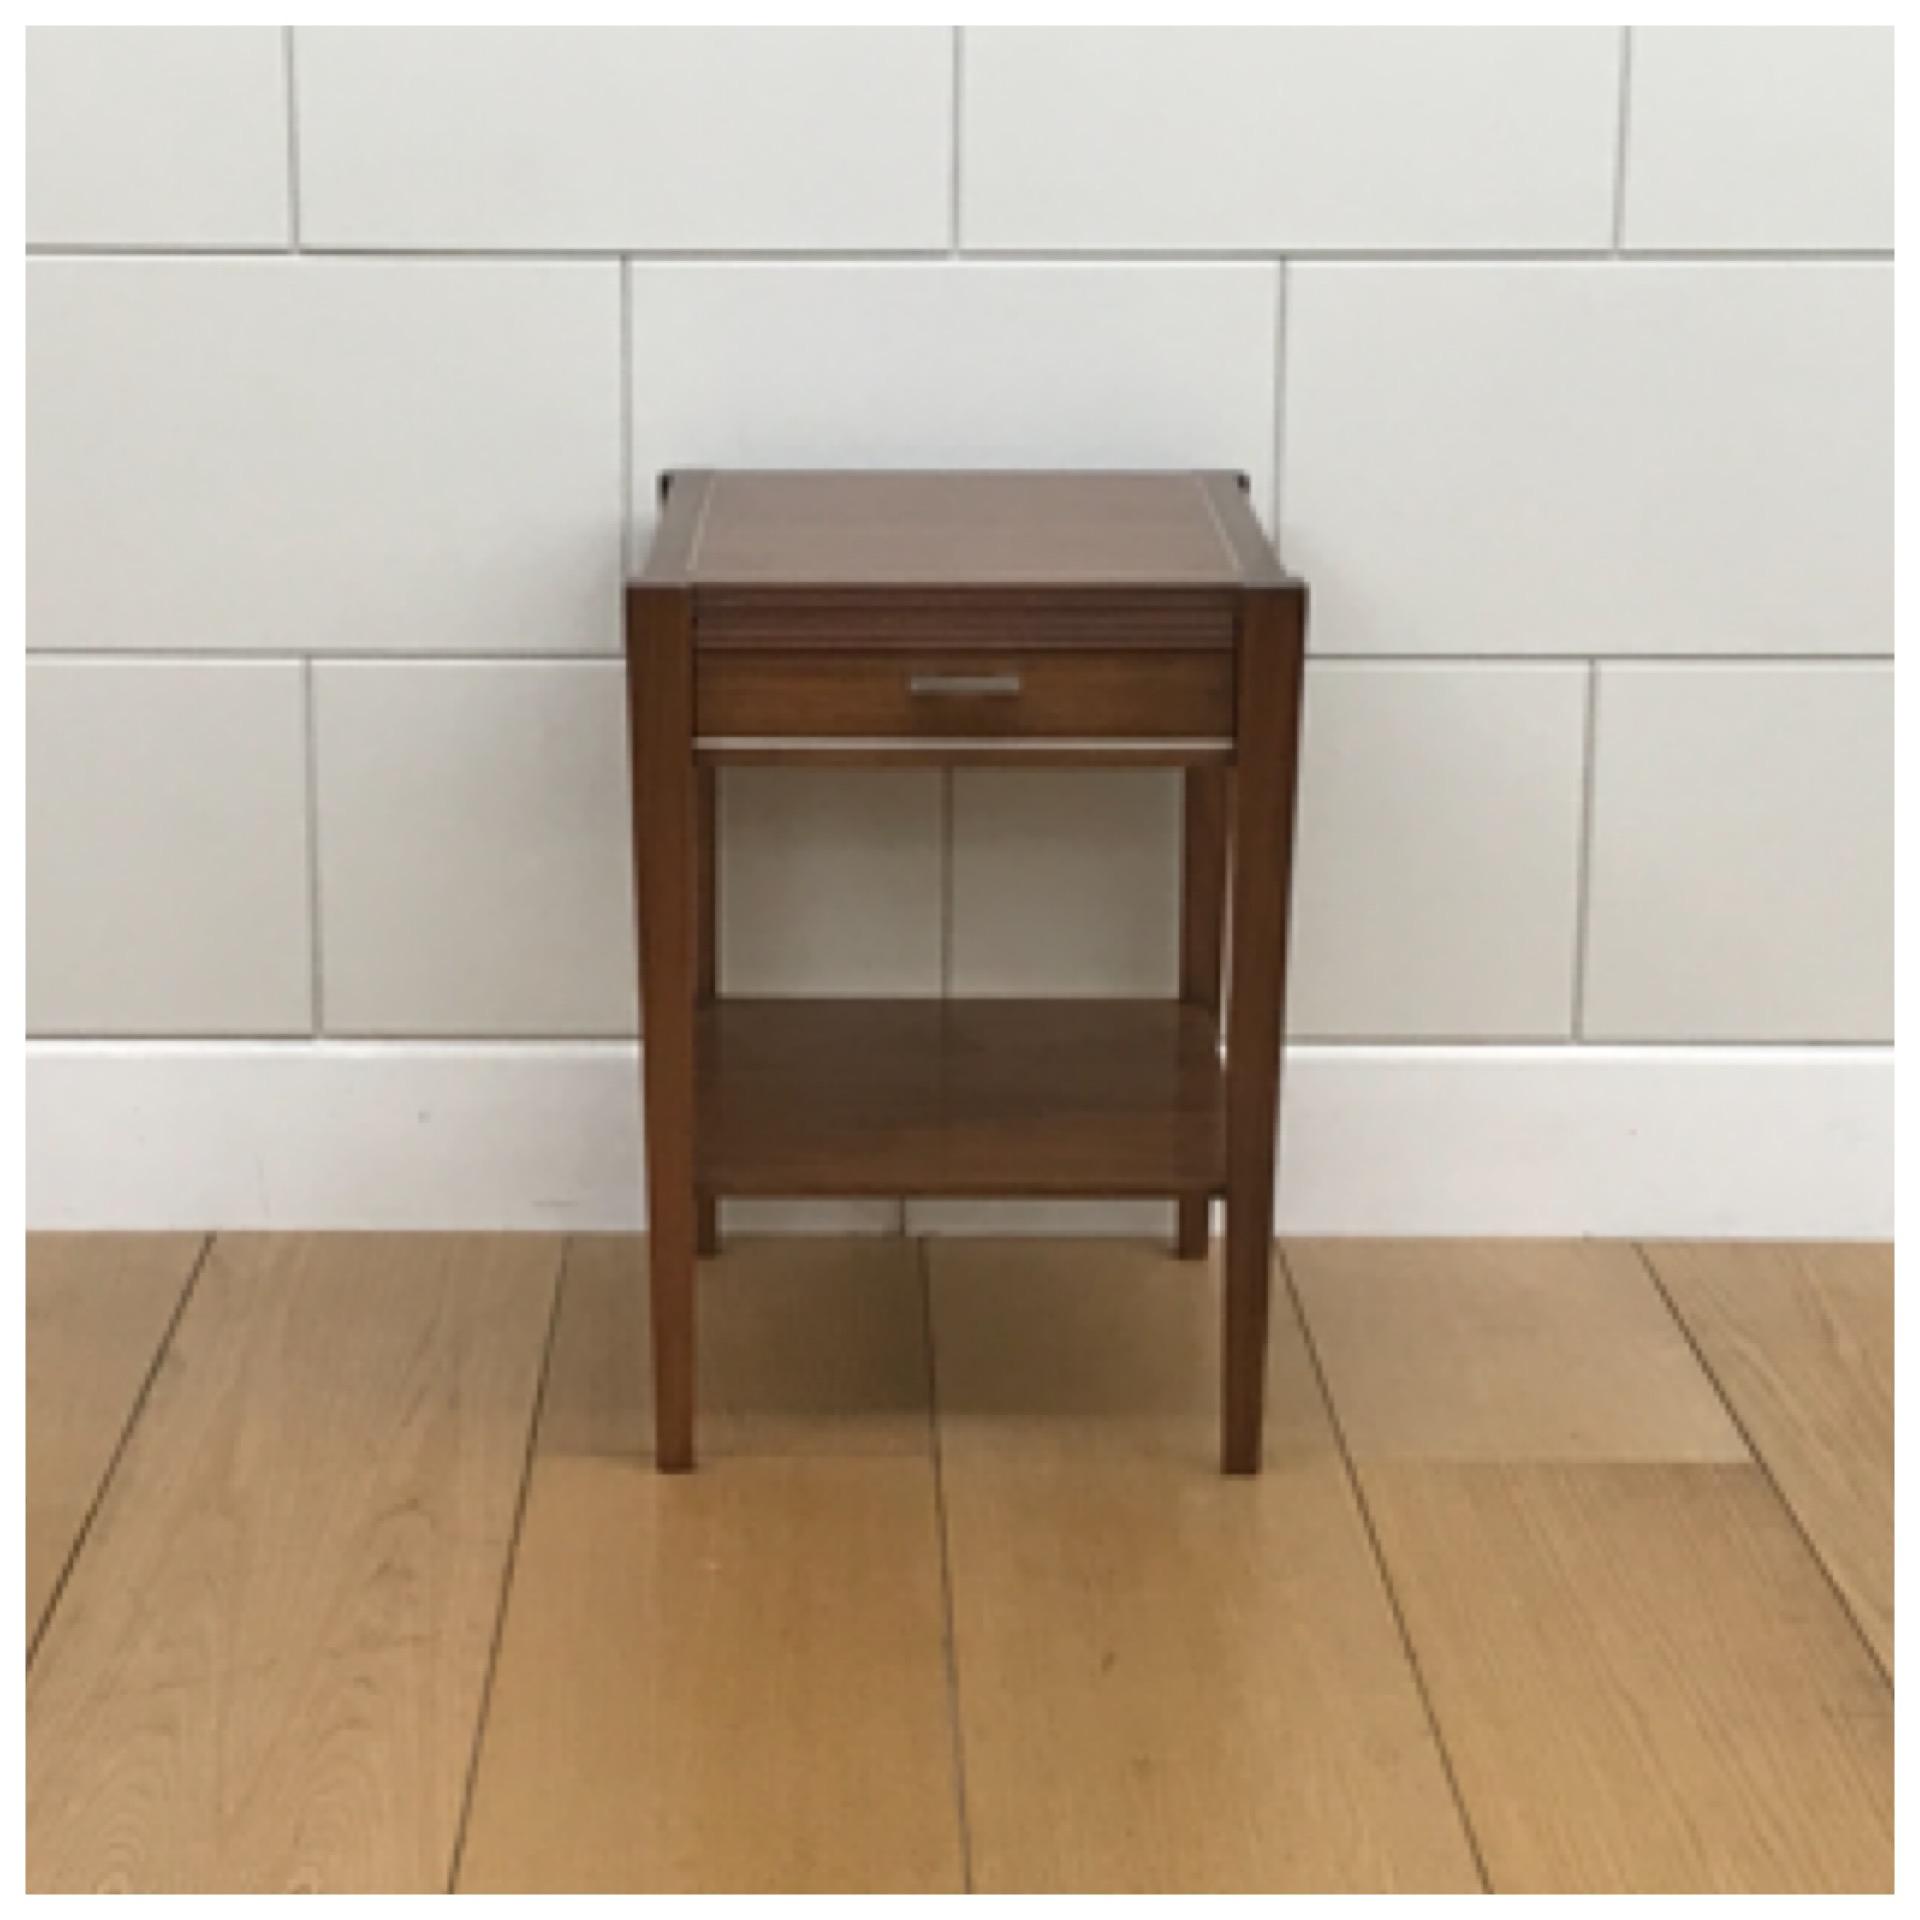 Sale Price: £490